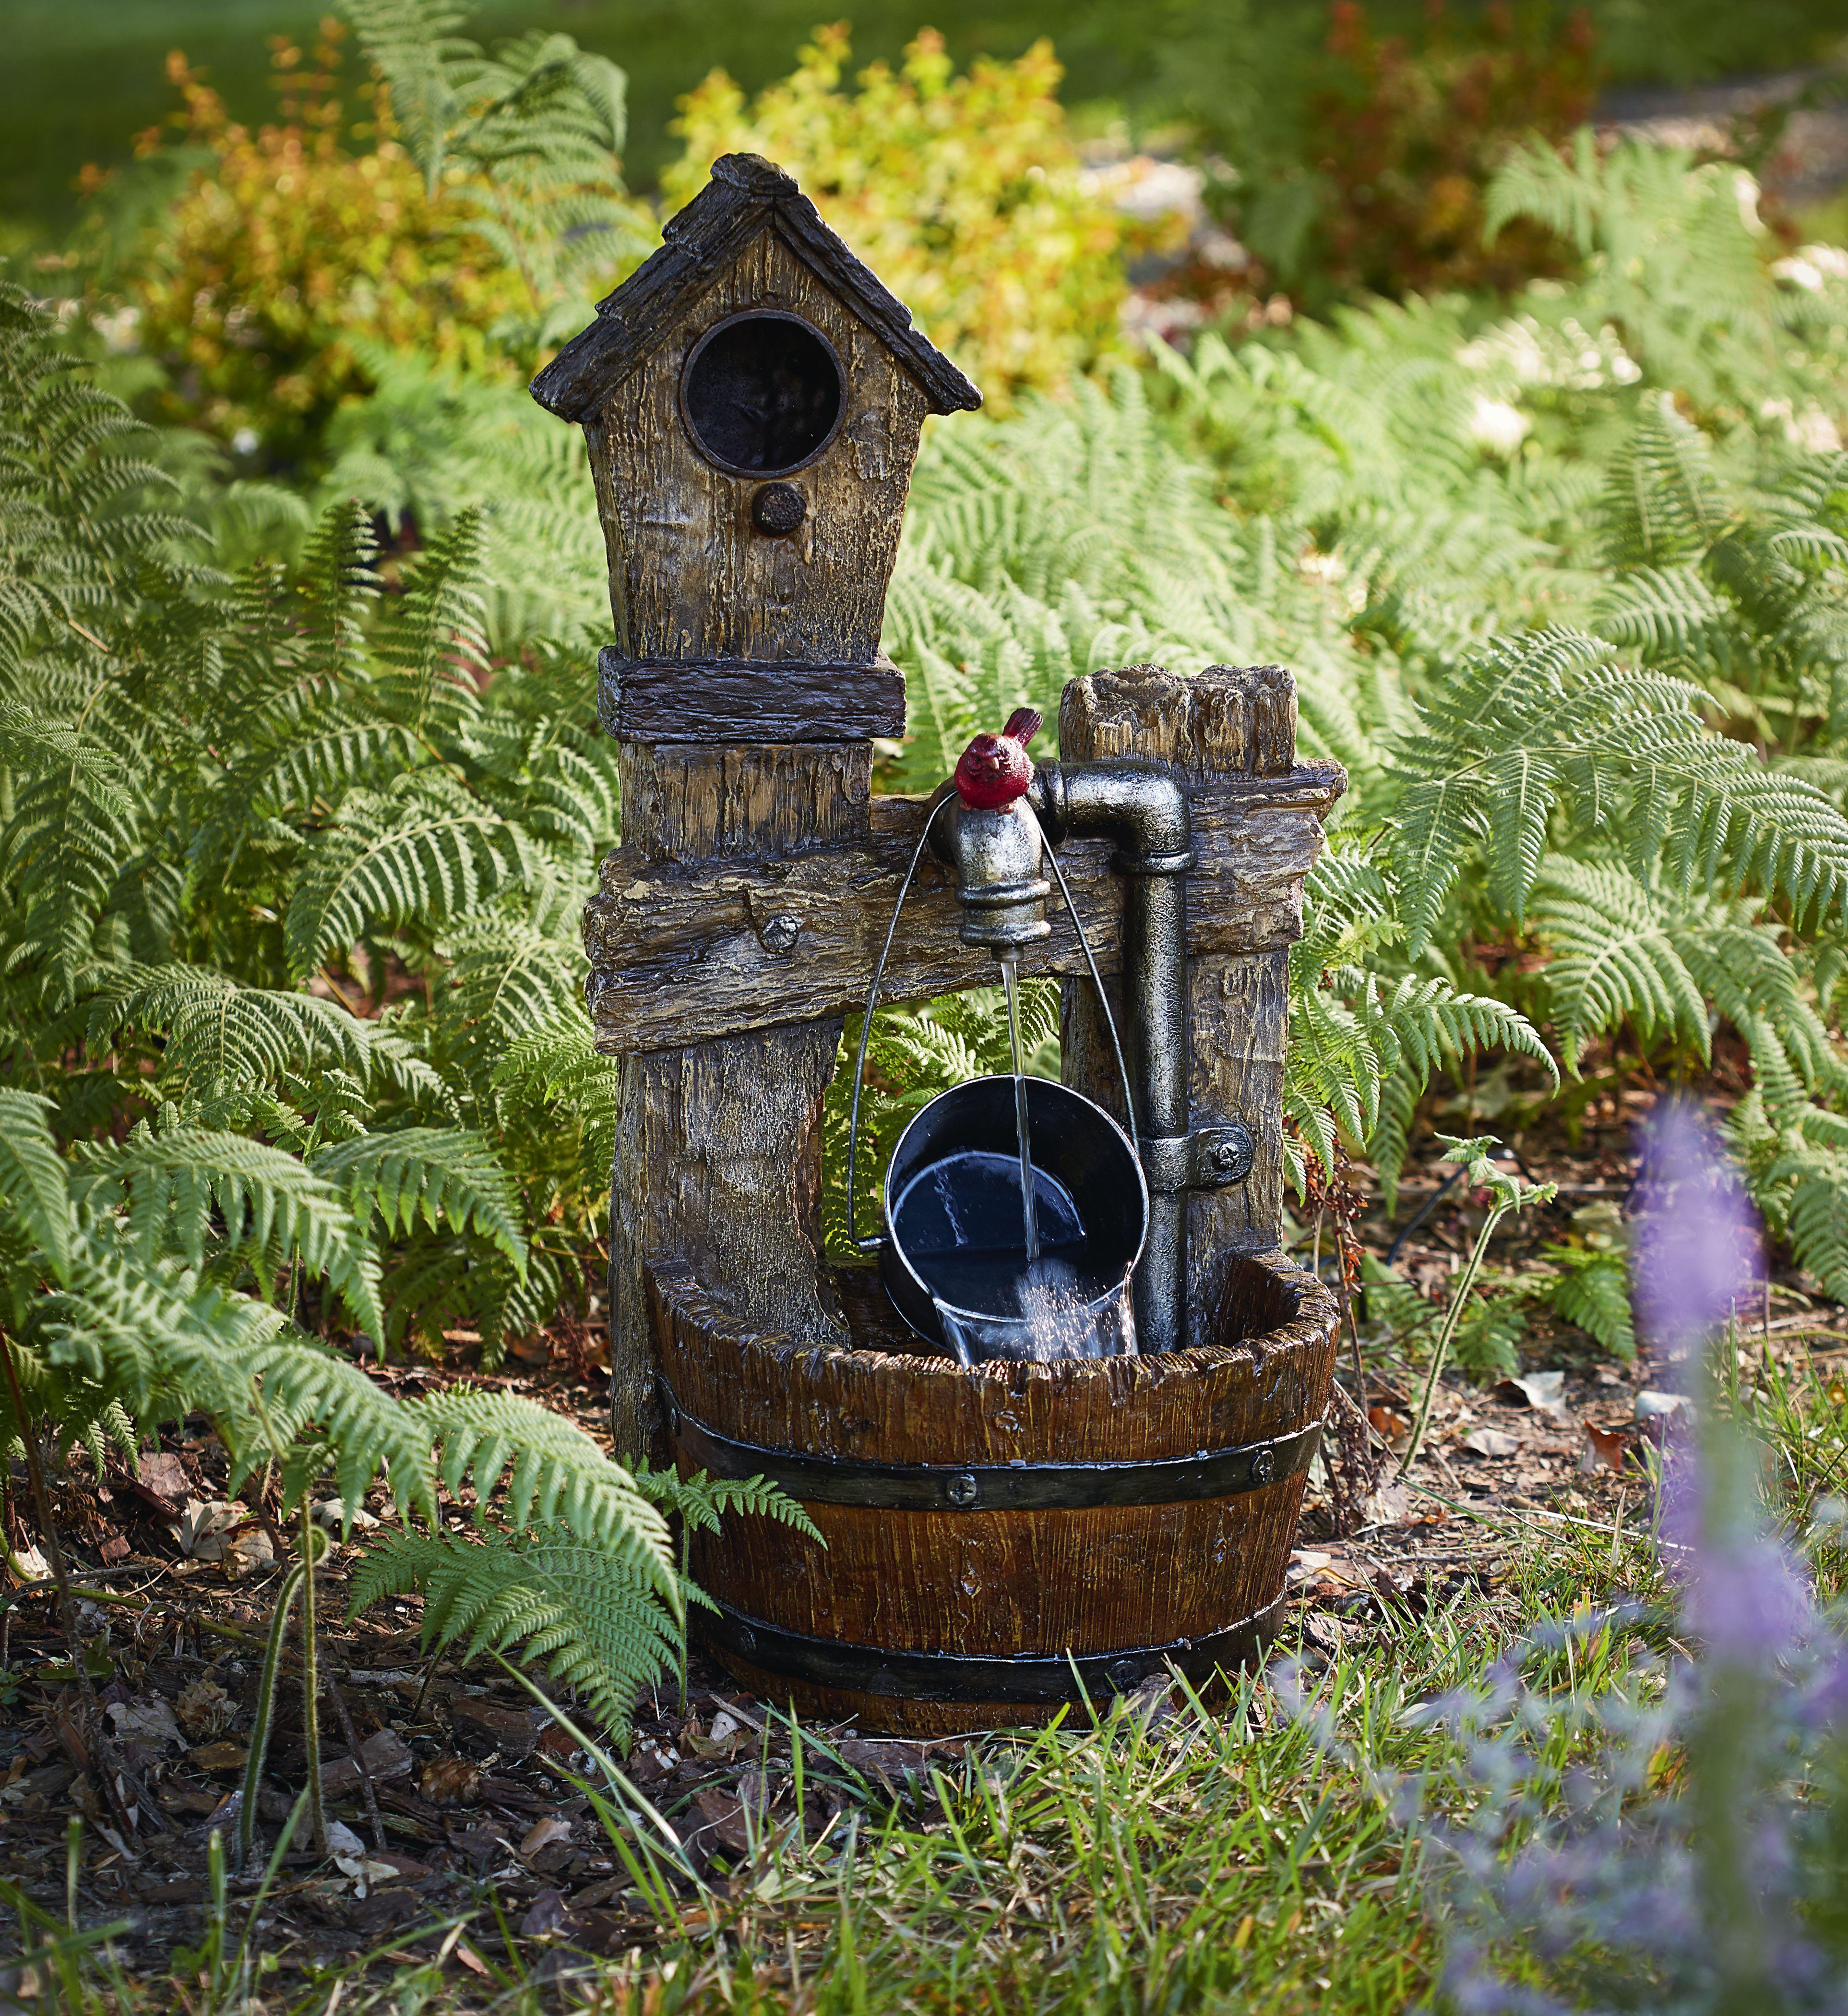 Birdhouse and Barrel Fountain